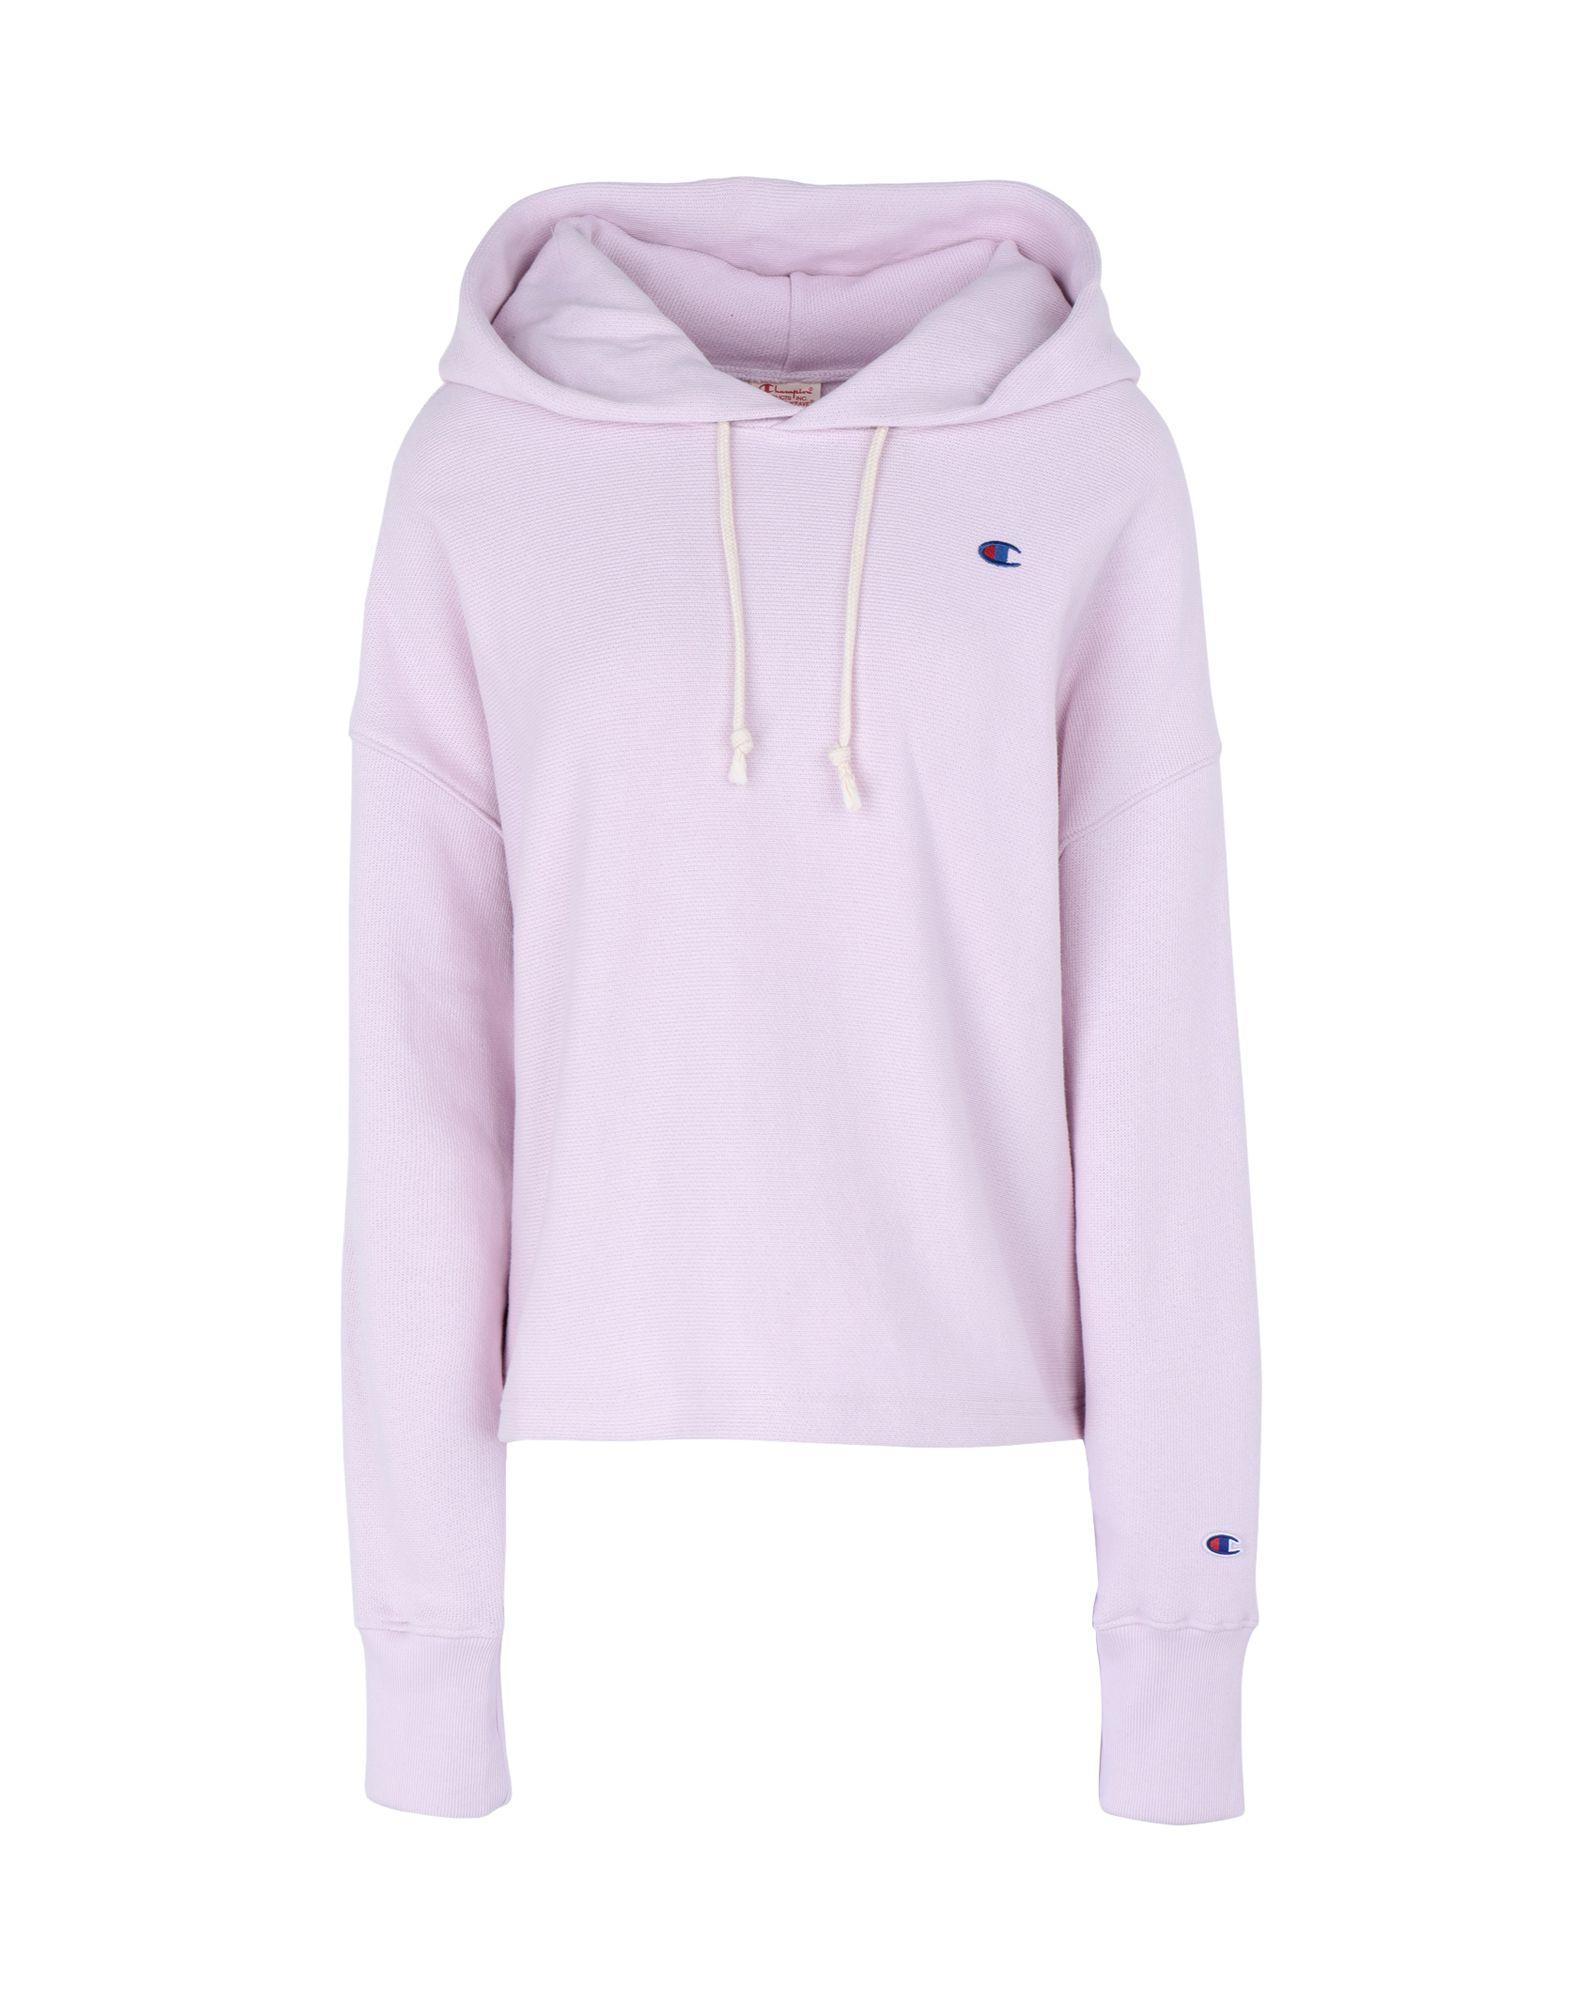 31f4a7718bf7 Champion Reverse Weave Maxi Hooded Sweatshirt - Technical Sweatshirts And  Sweaters - Women Champion Reverse Weave Technical Sweatshirts And Sweaters  online ...